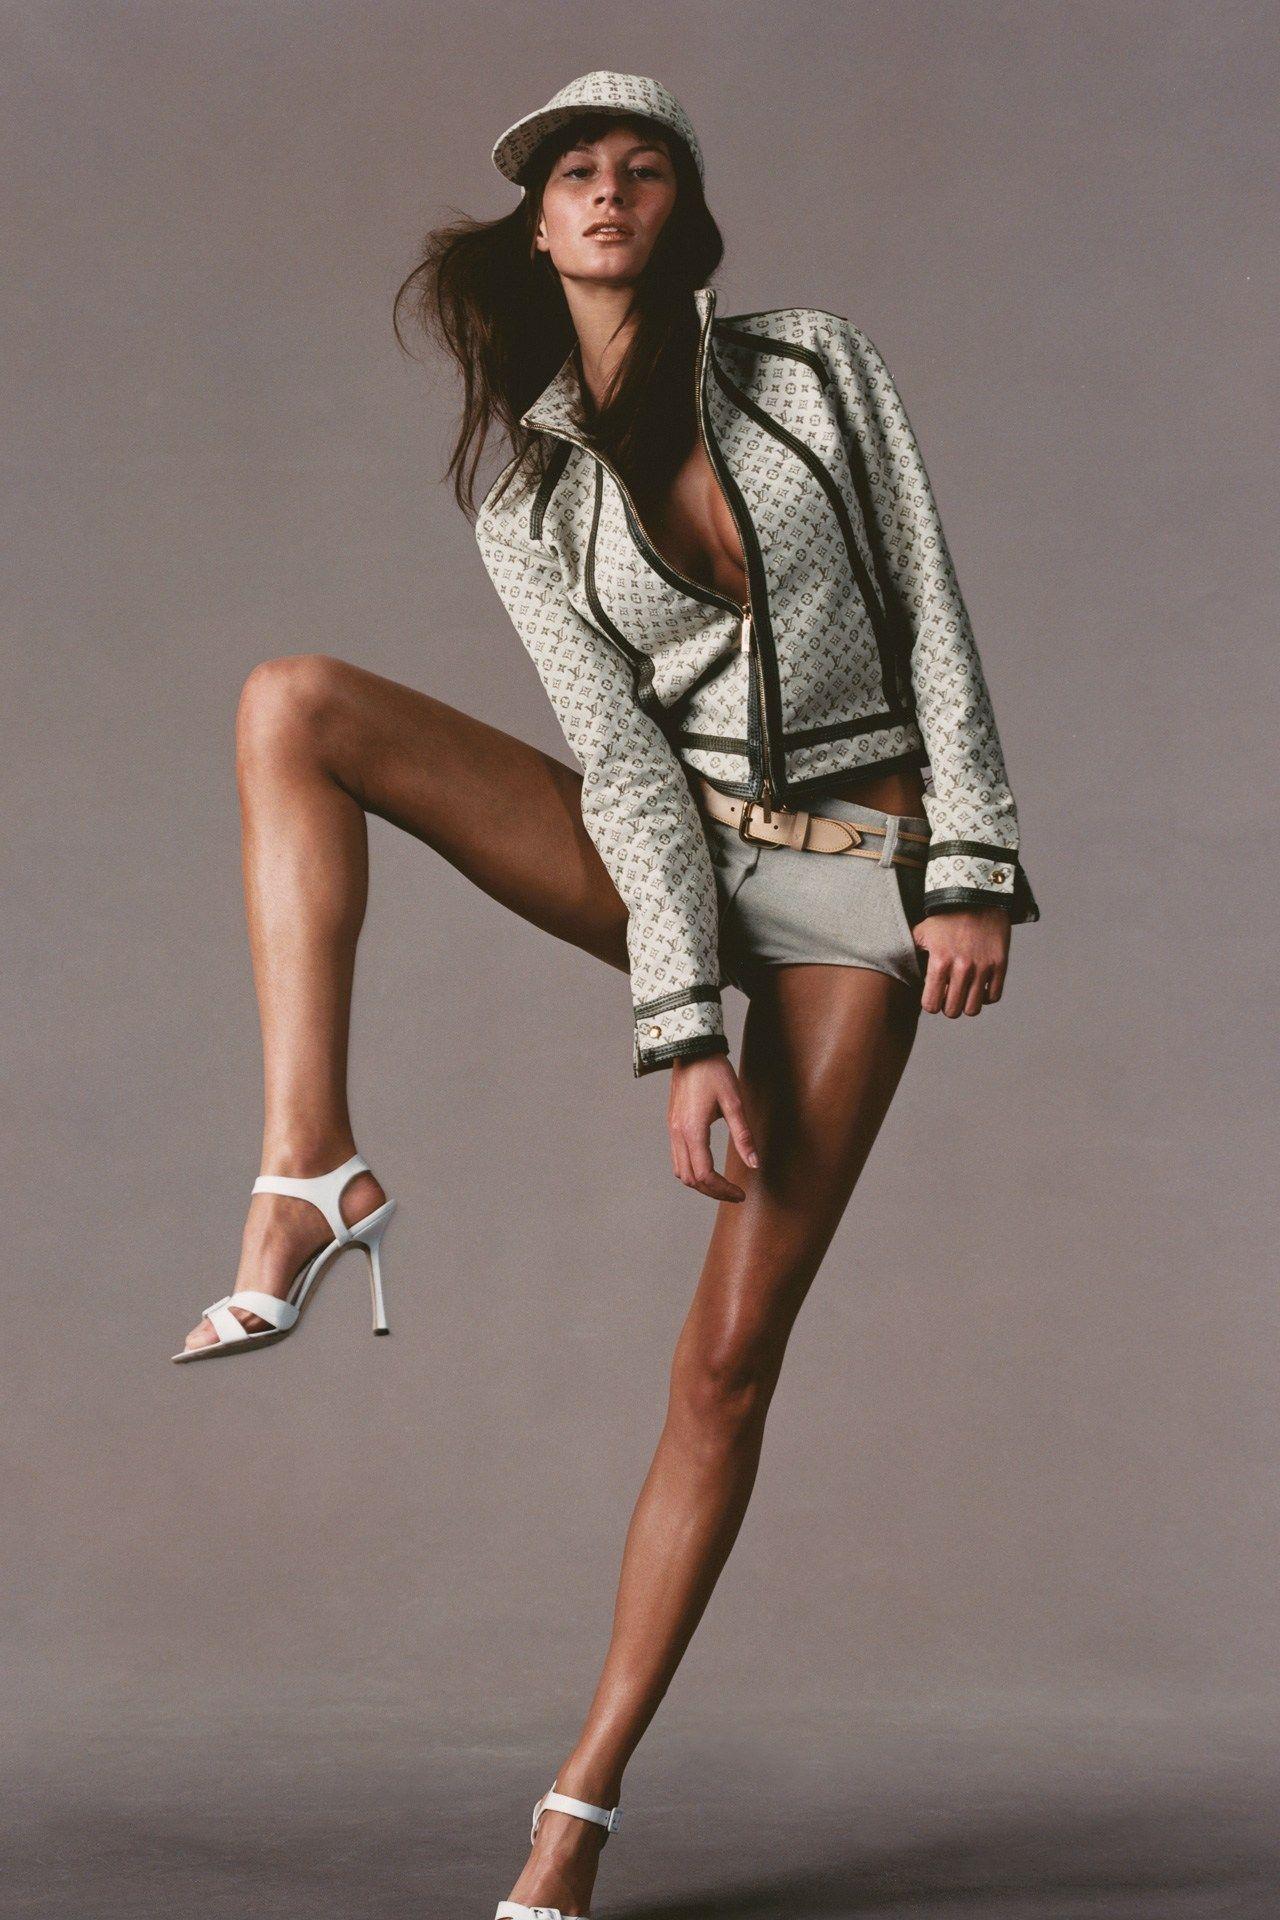 8a503652de698 Gisele Bundchen Style File  Chart the Vogue cover girl s life in the  fashion spotlight -